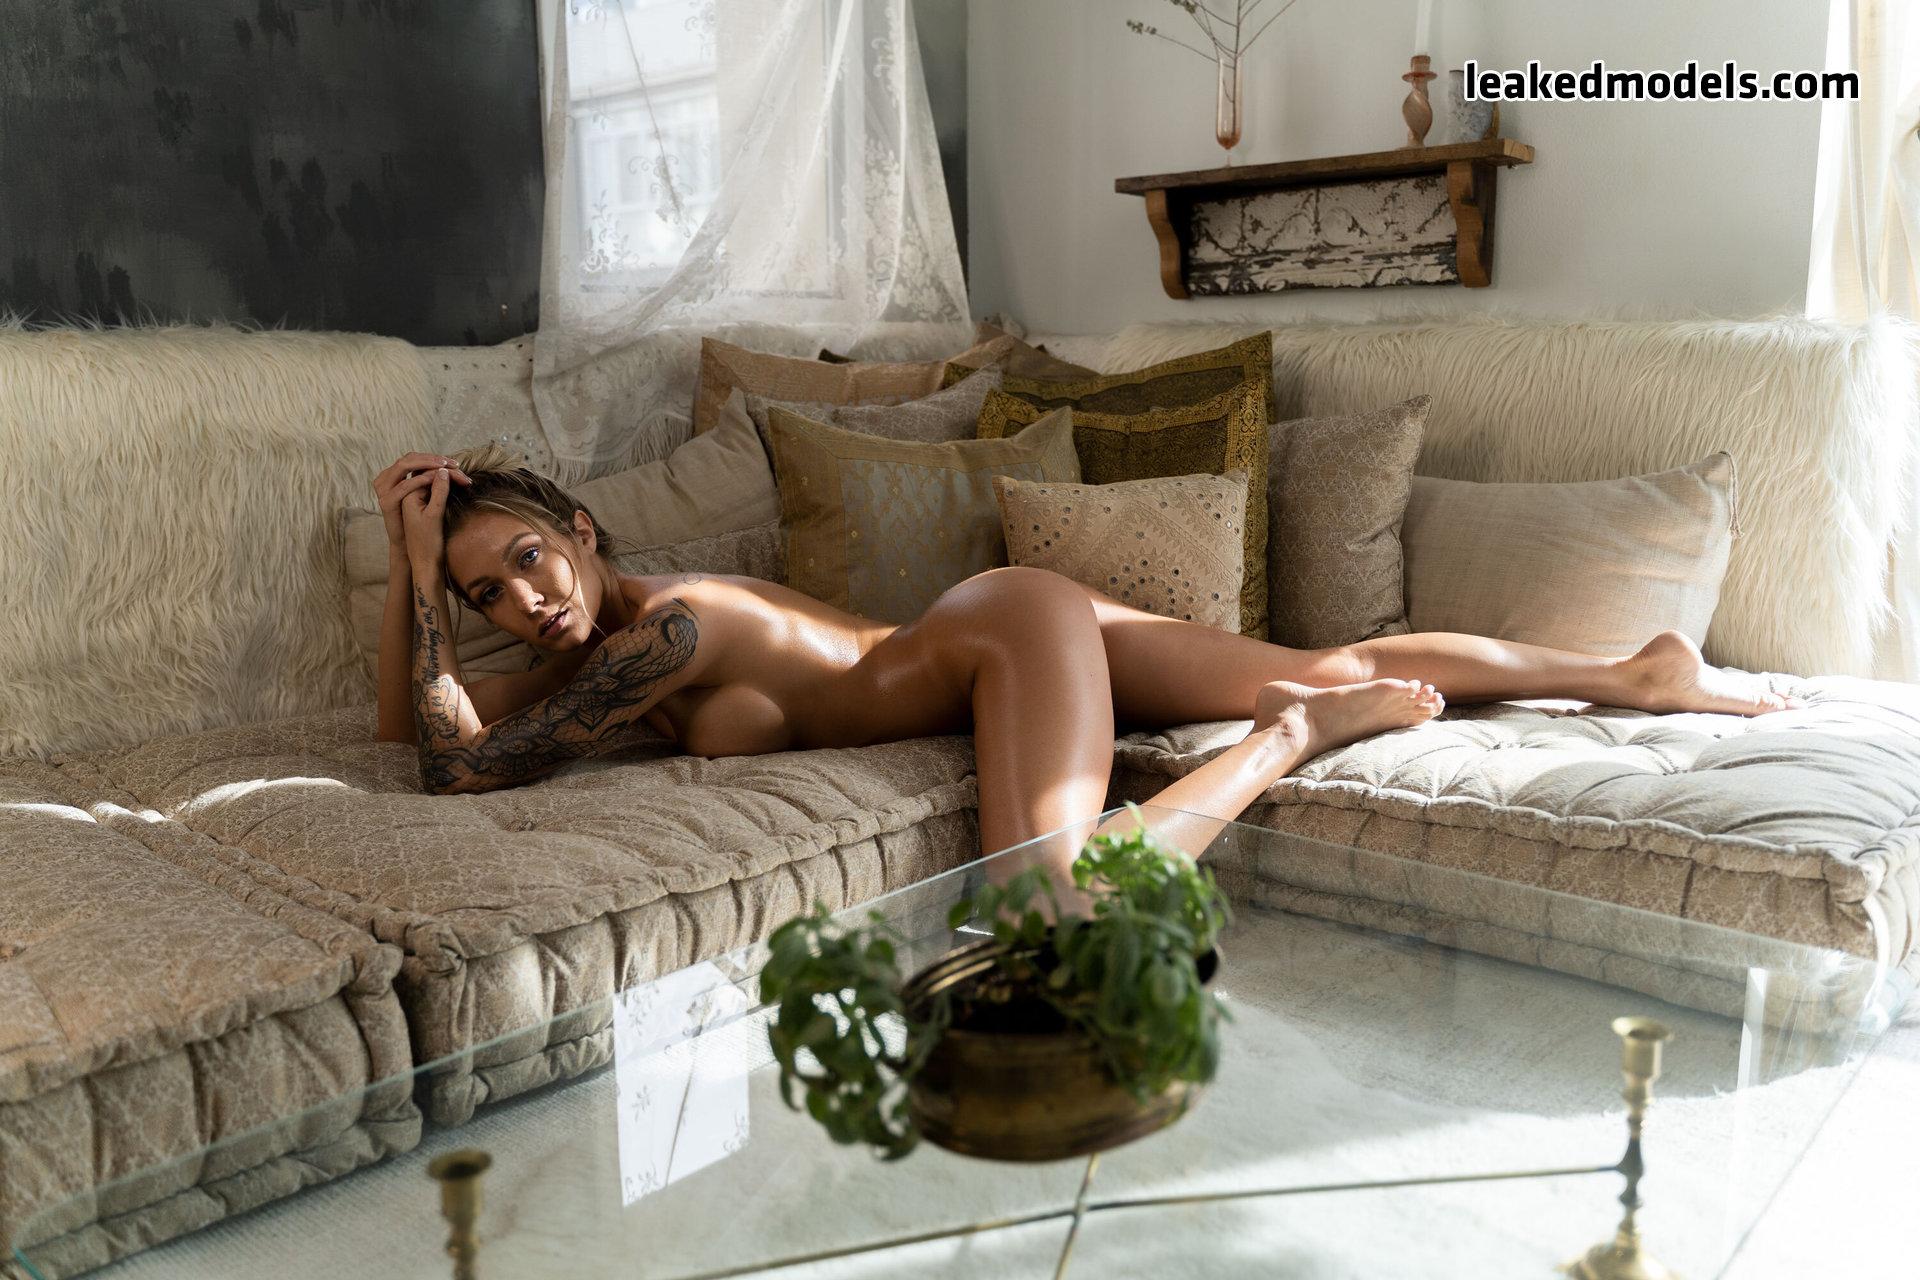 Elle – ellebelle1 OnlyFans Nude Leaks (40 Photos)